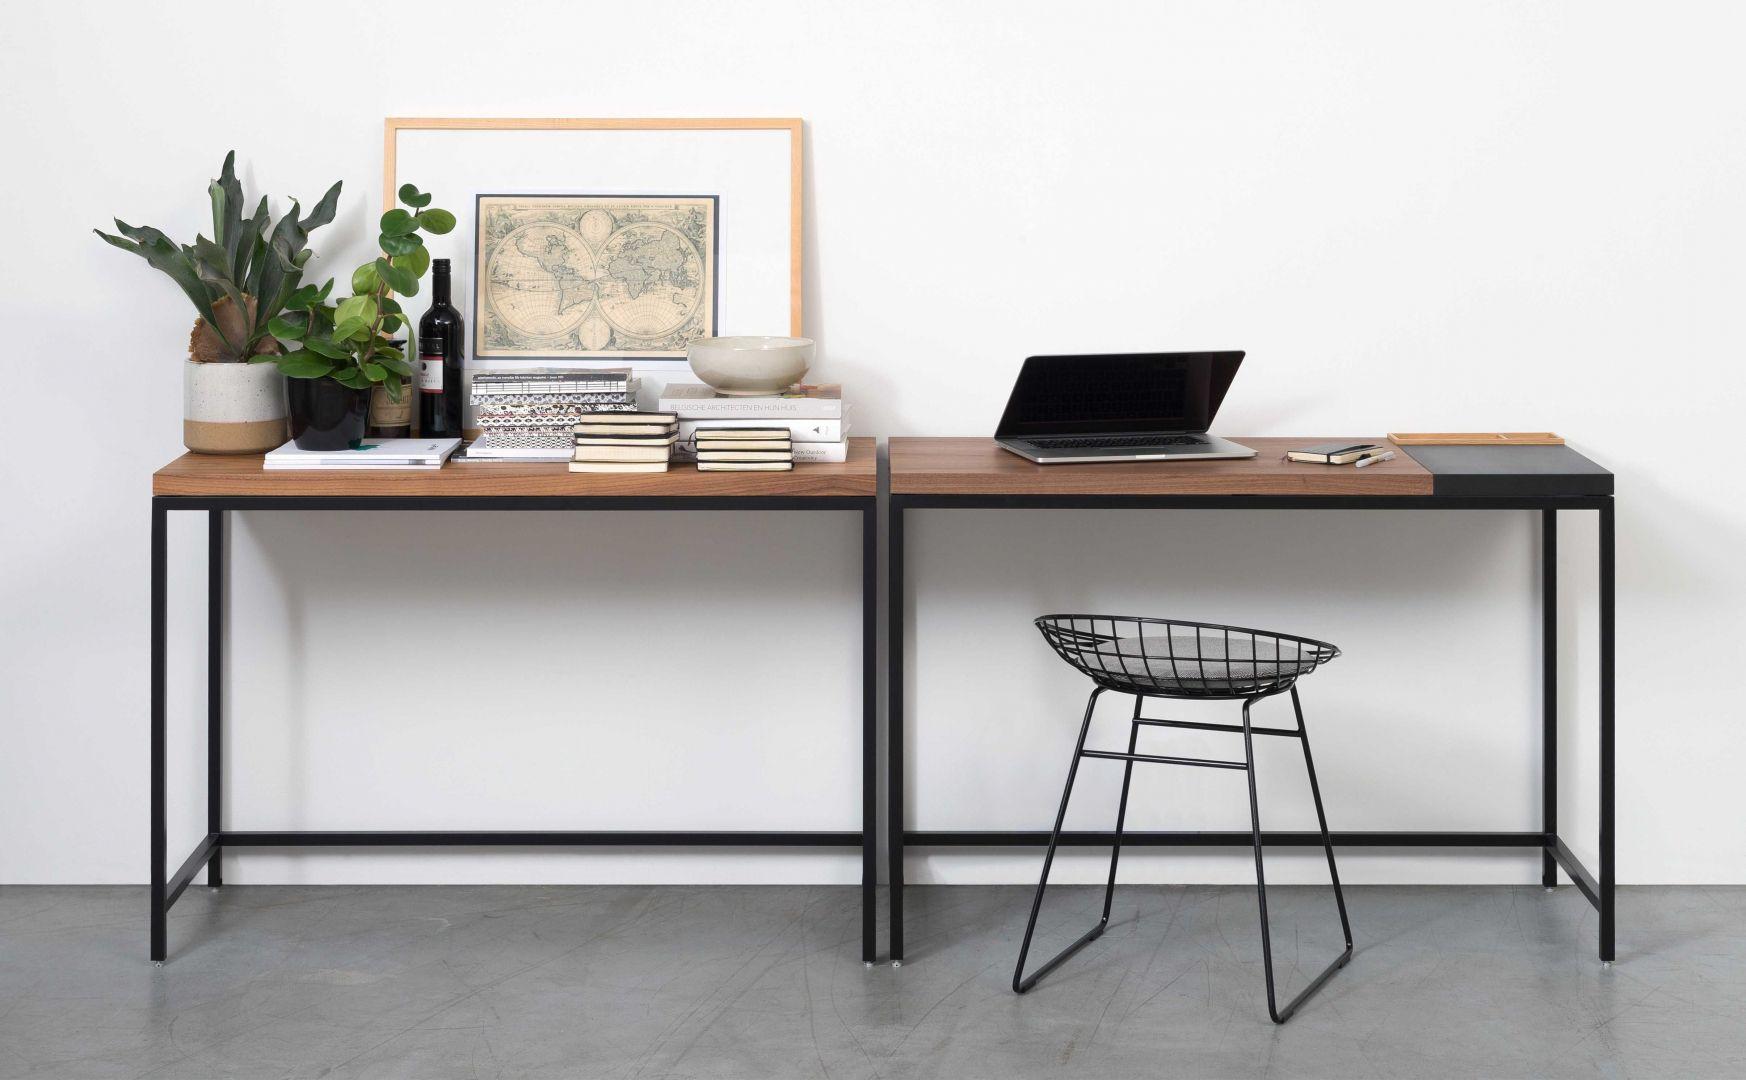 Werkplek Werkplek inspiratiefoto met Pastoe Stoelen